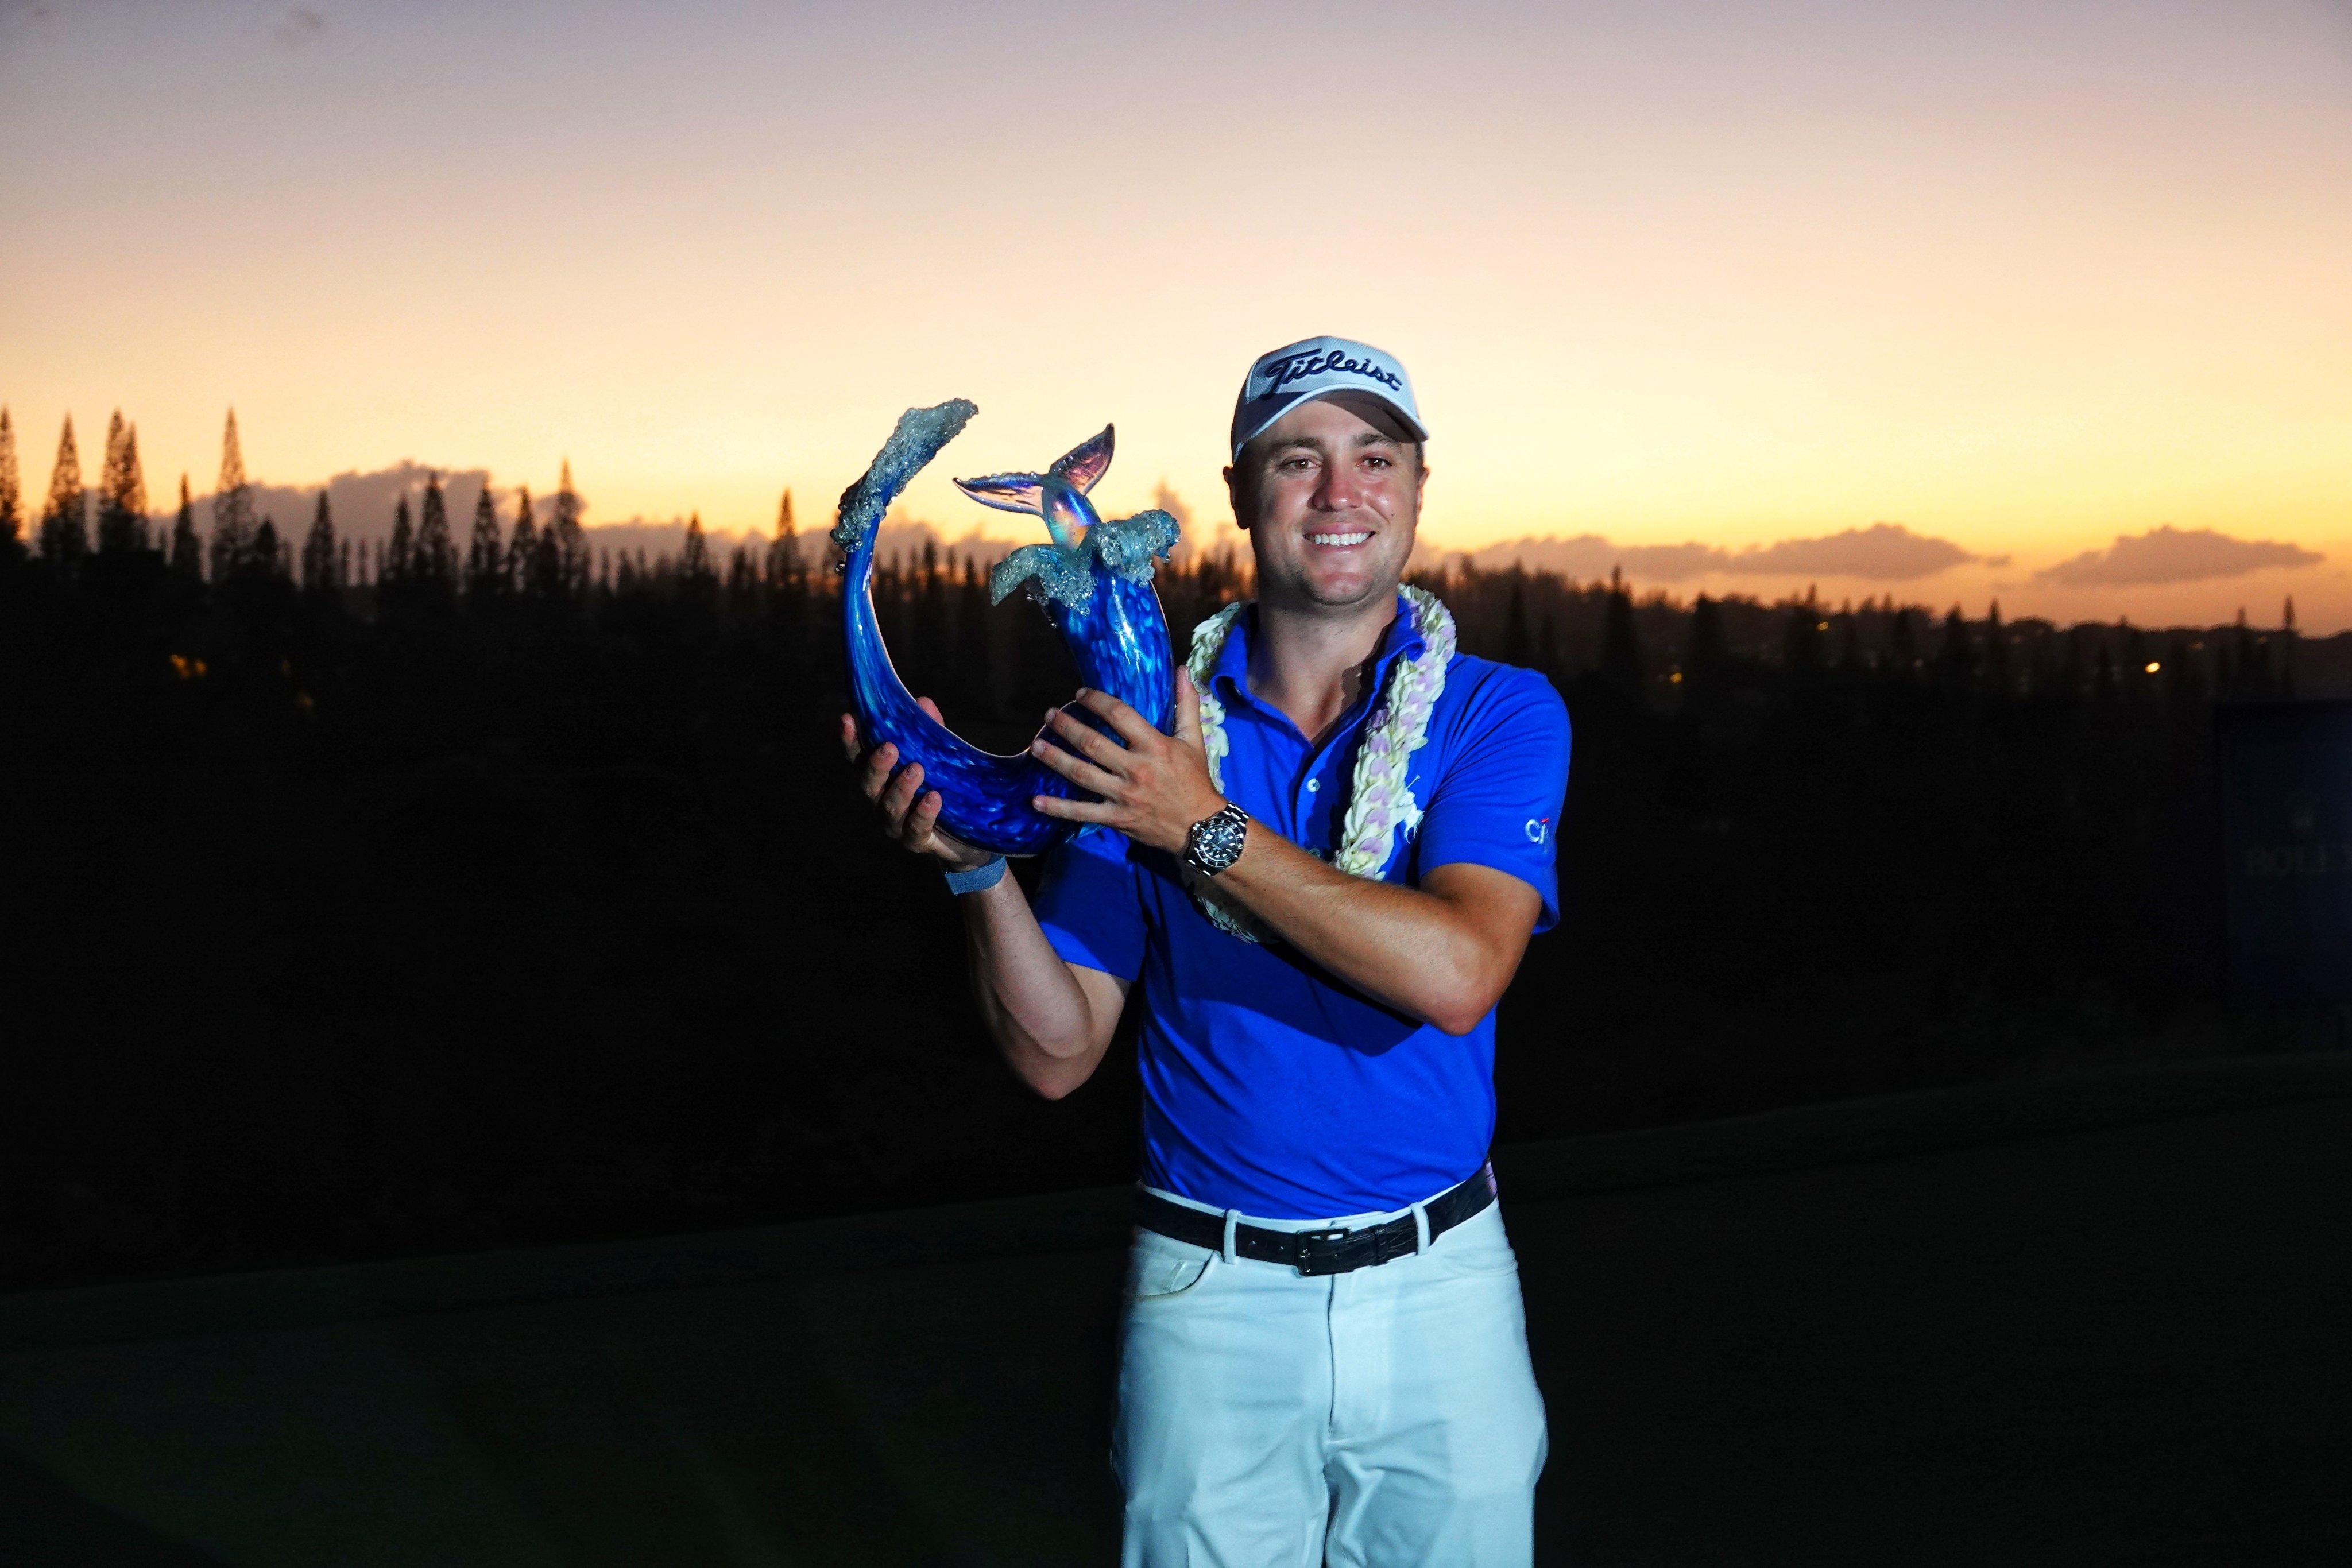 Golf - Tour américain - Tournament of Champions: Justin Thomas s'impose en playoff à Hawaï